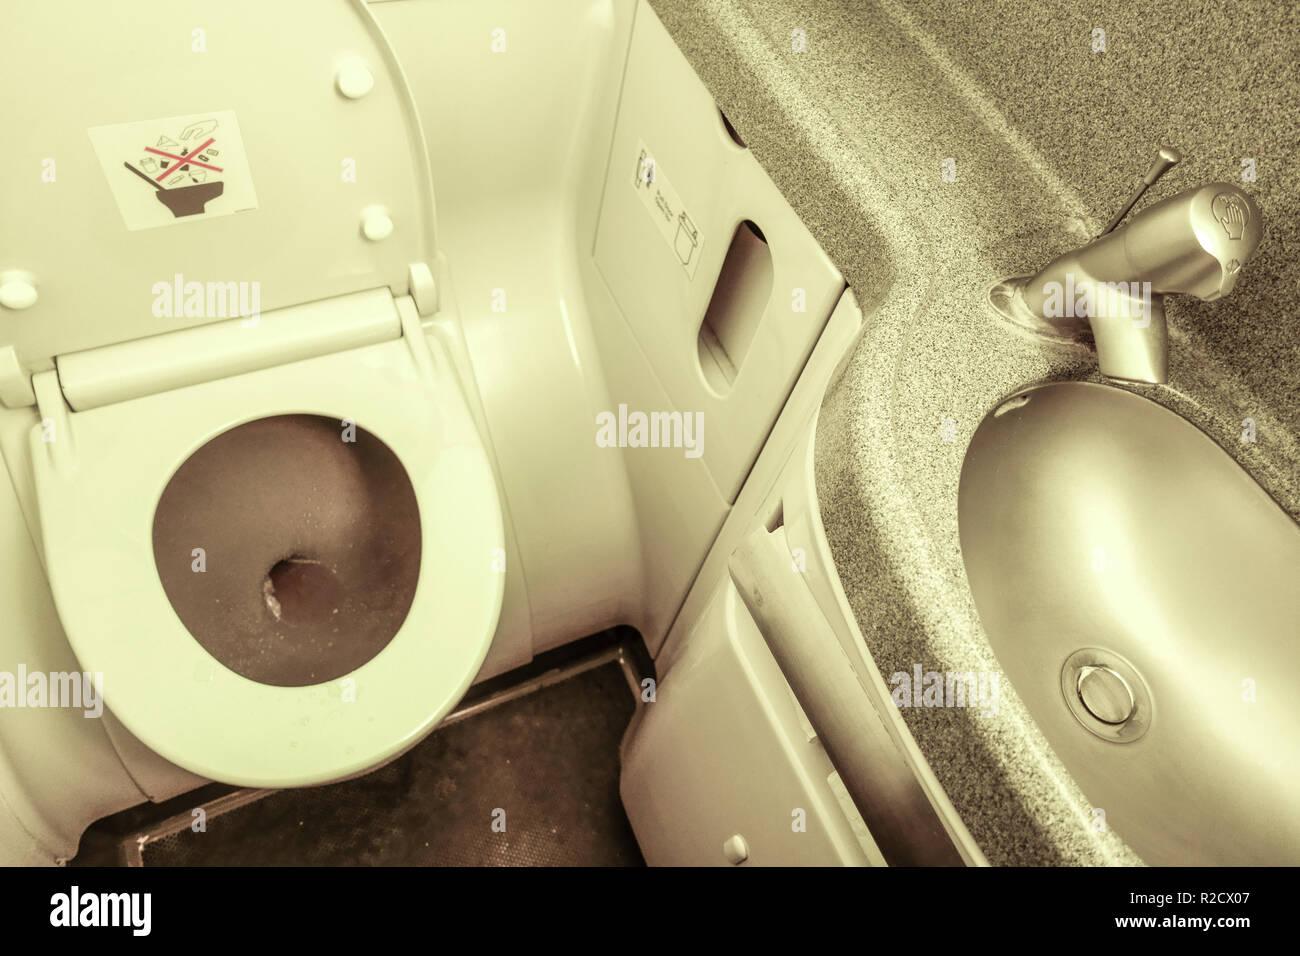 Boeing 737 airplane toilet interior - Stock Image